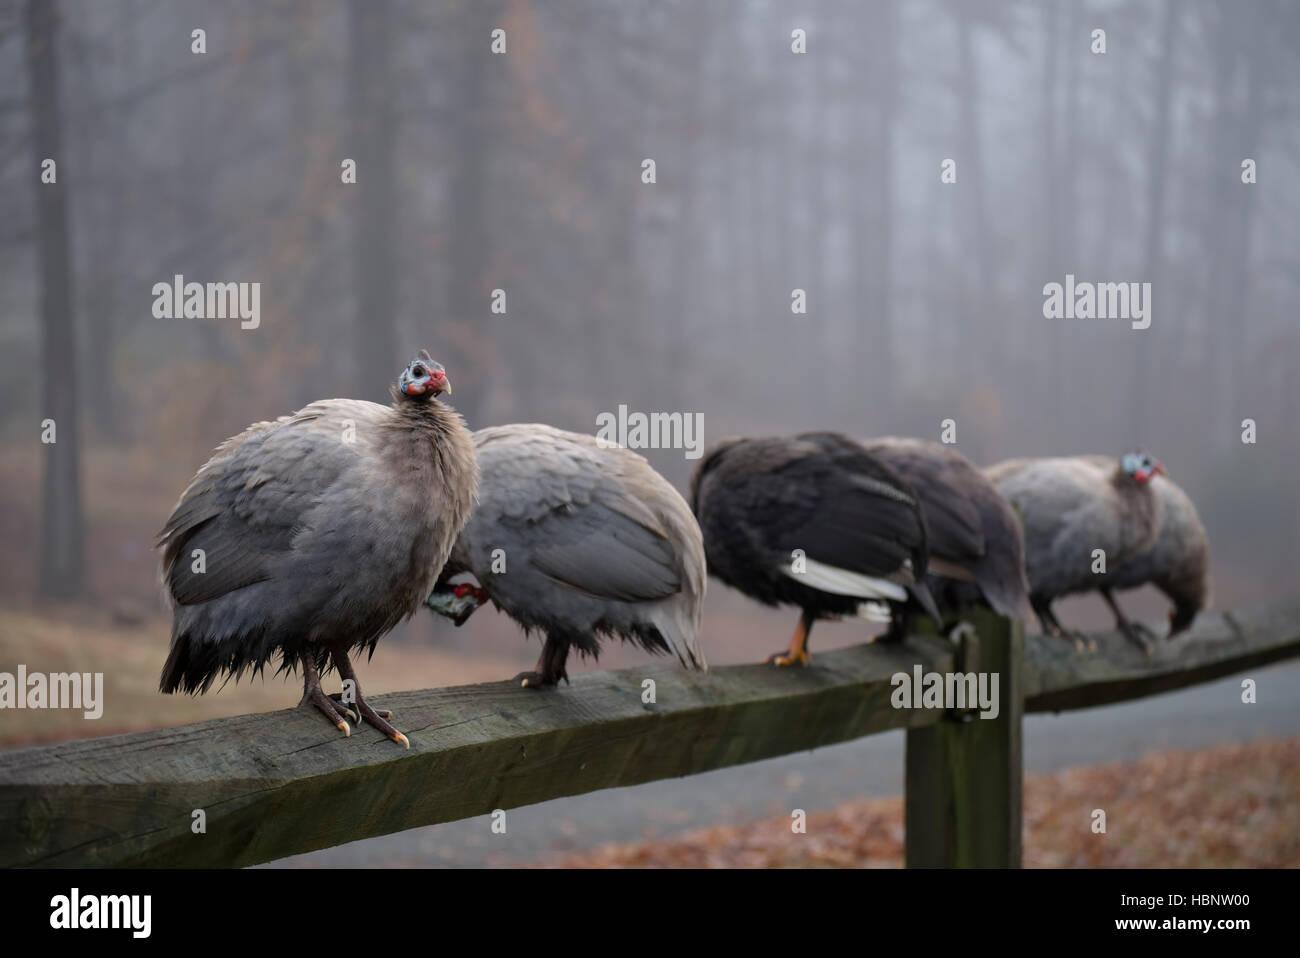 Guinea Fowl on fence rail - Stock Image